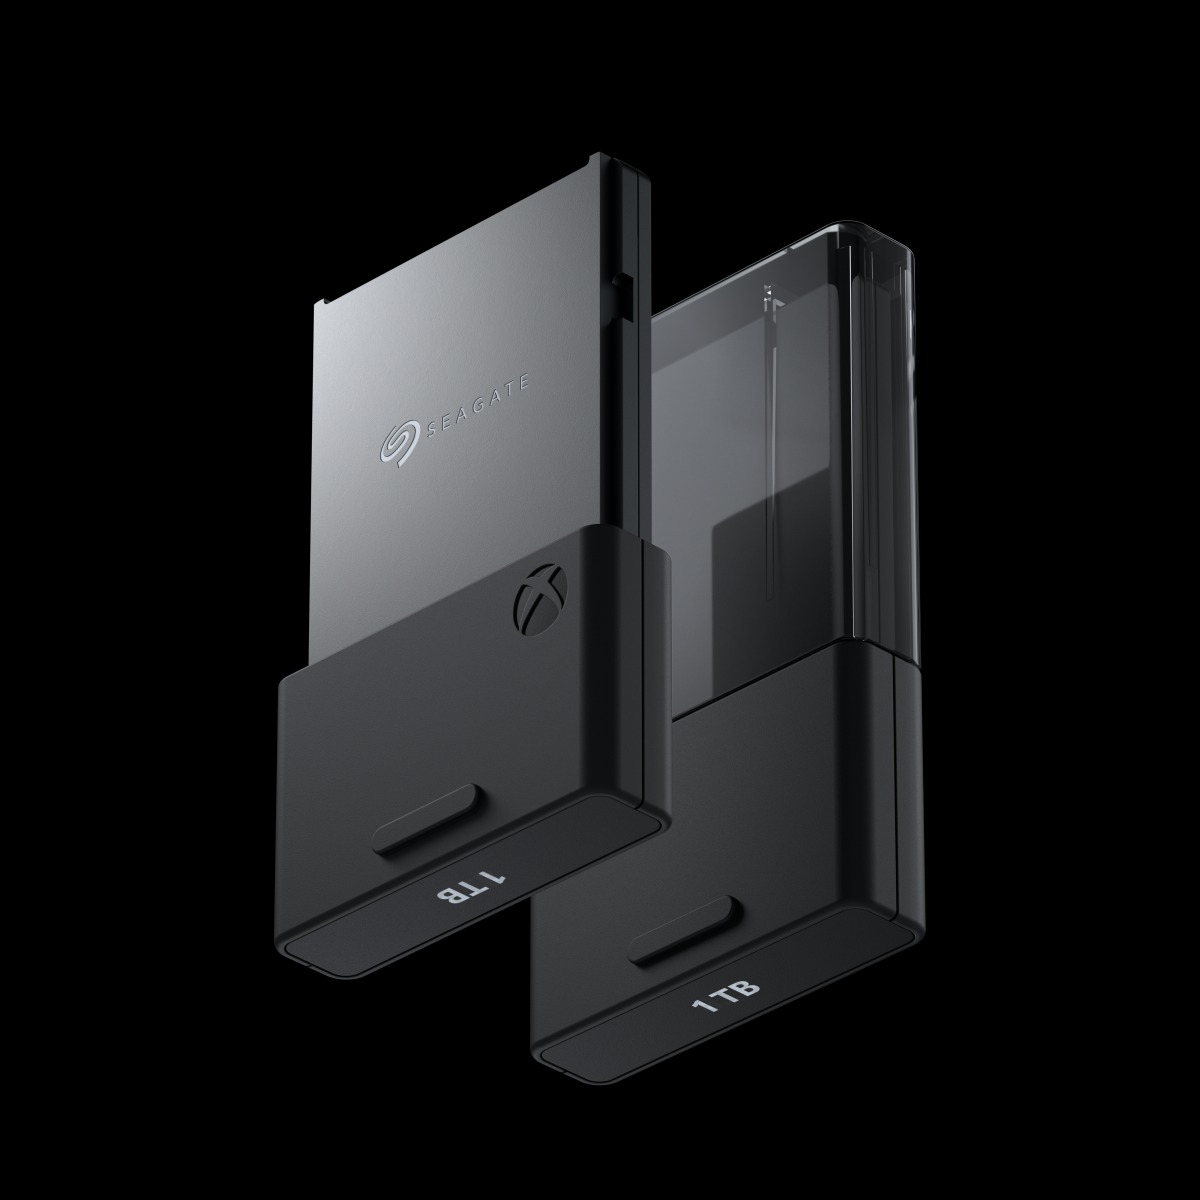 Карта для увеличения объема памяти на 1 терабайт для Xbox Series X / news.xbox.com